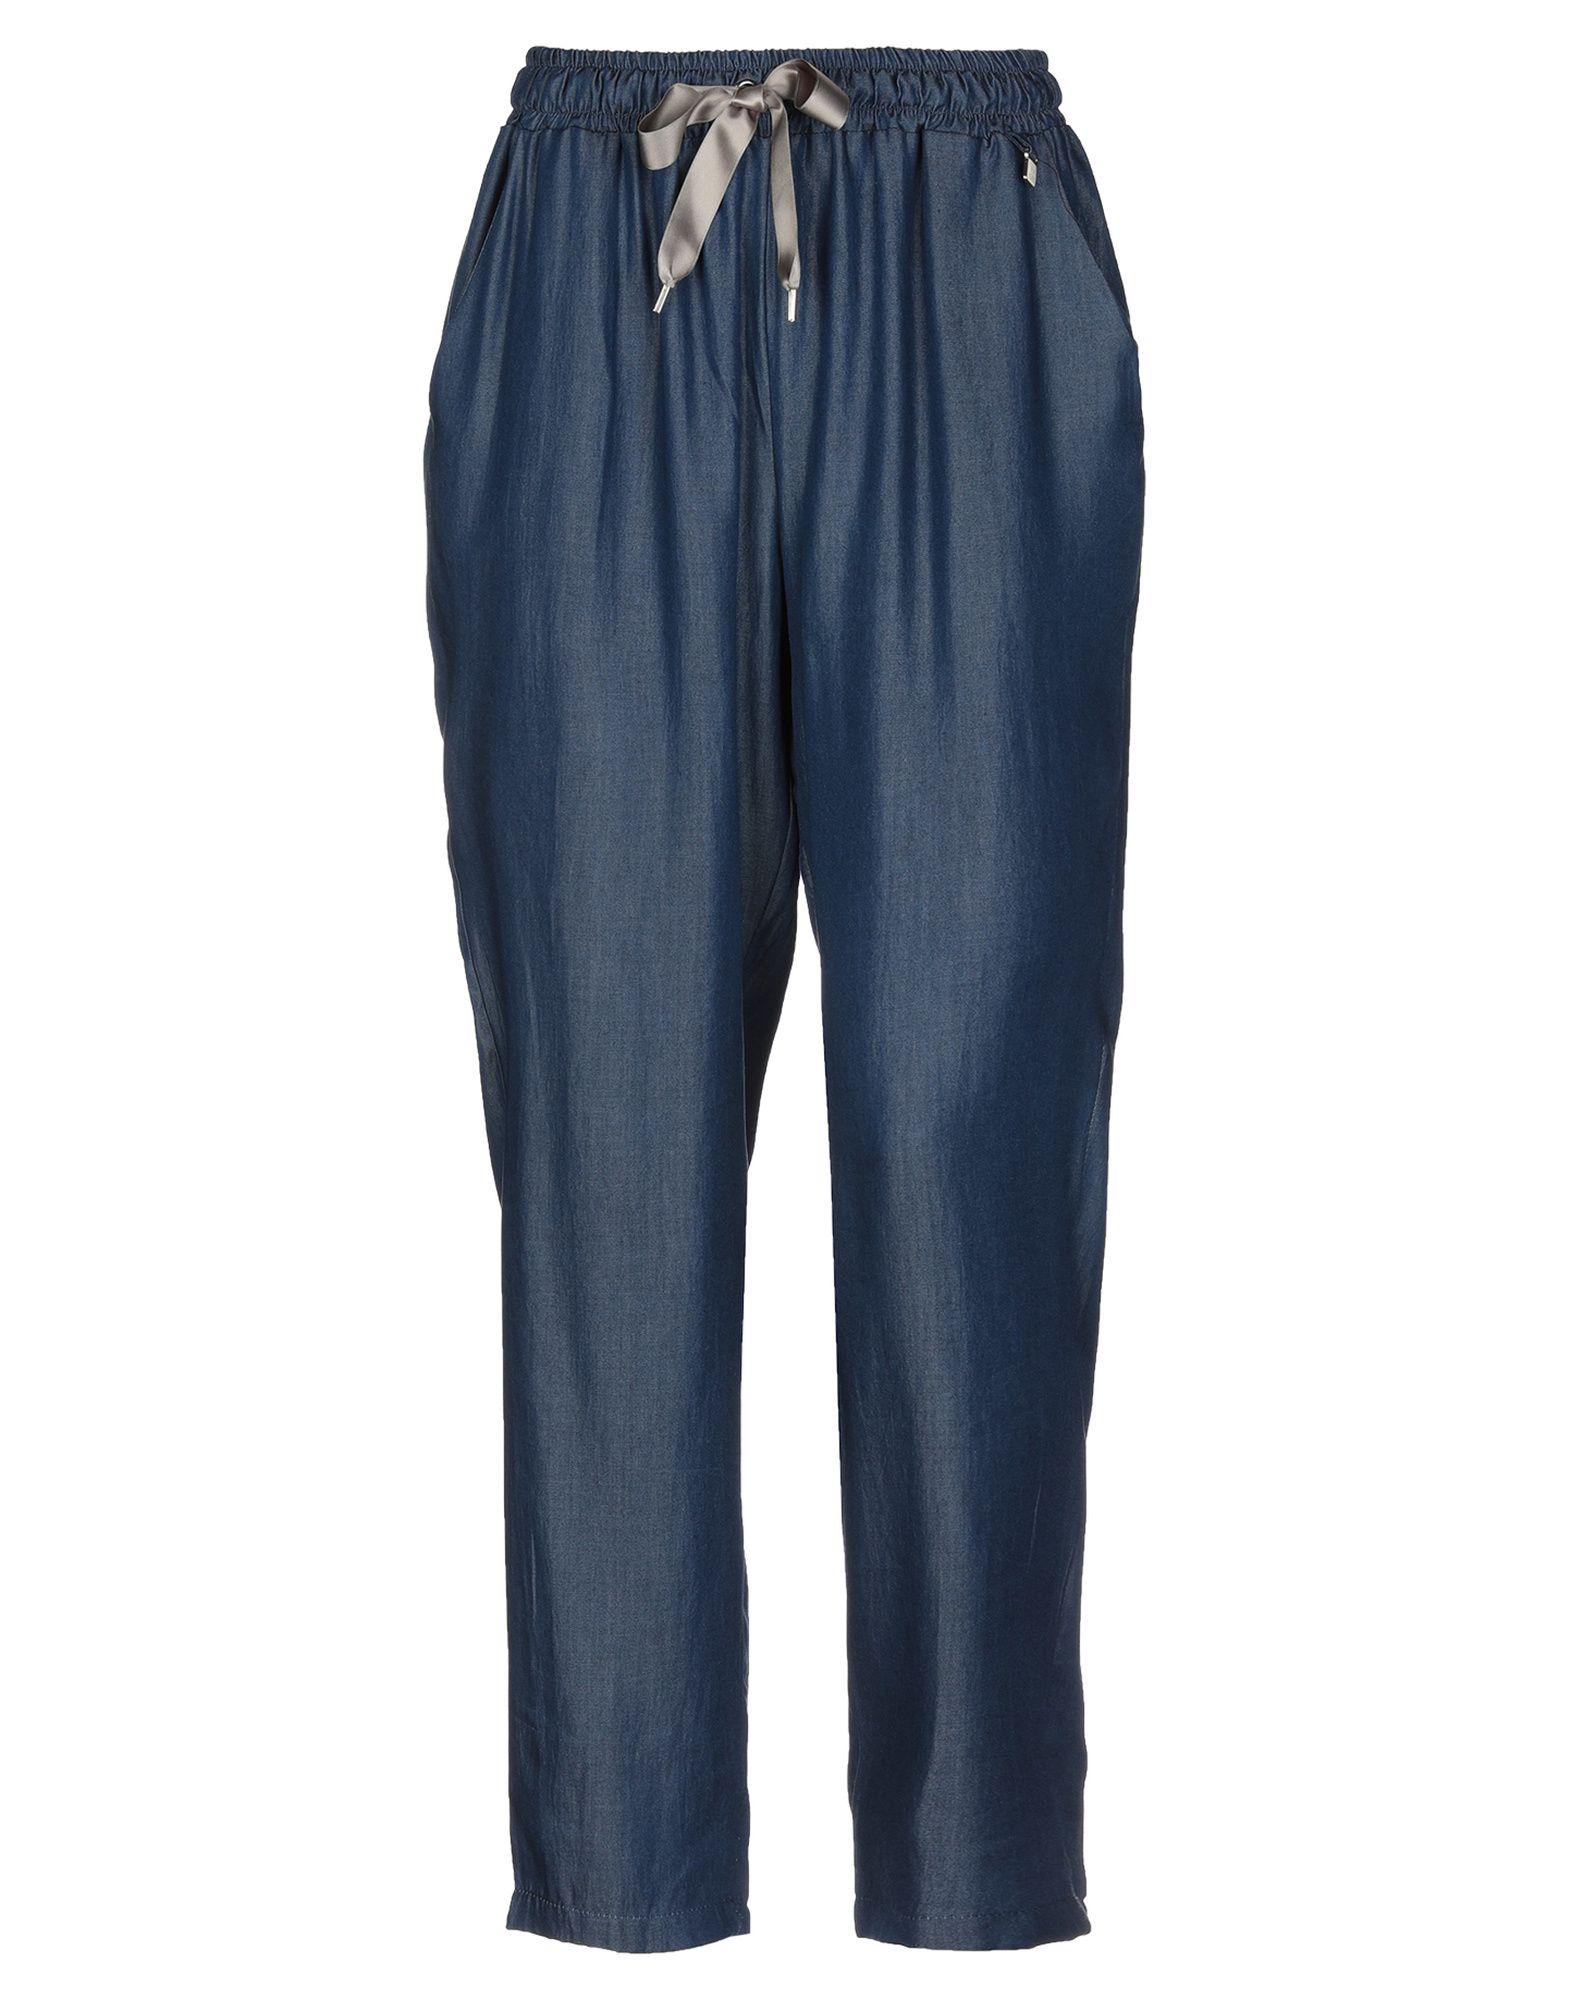 FLY GIRL Джинсовые брюки kaiwei 0639 elastic crus support brace wrap black